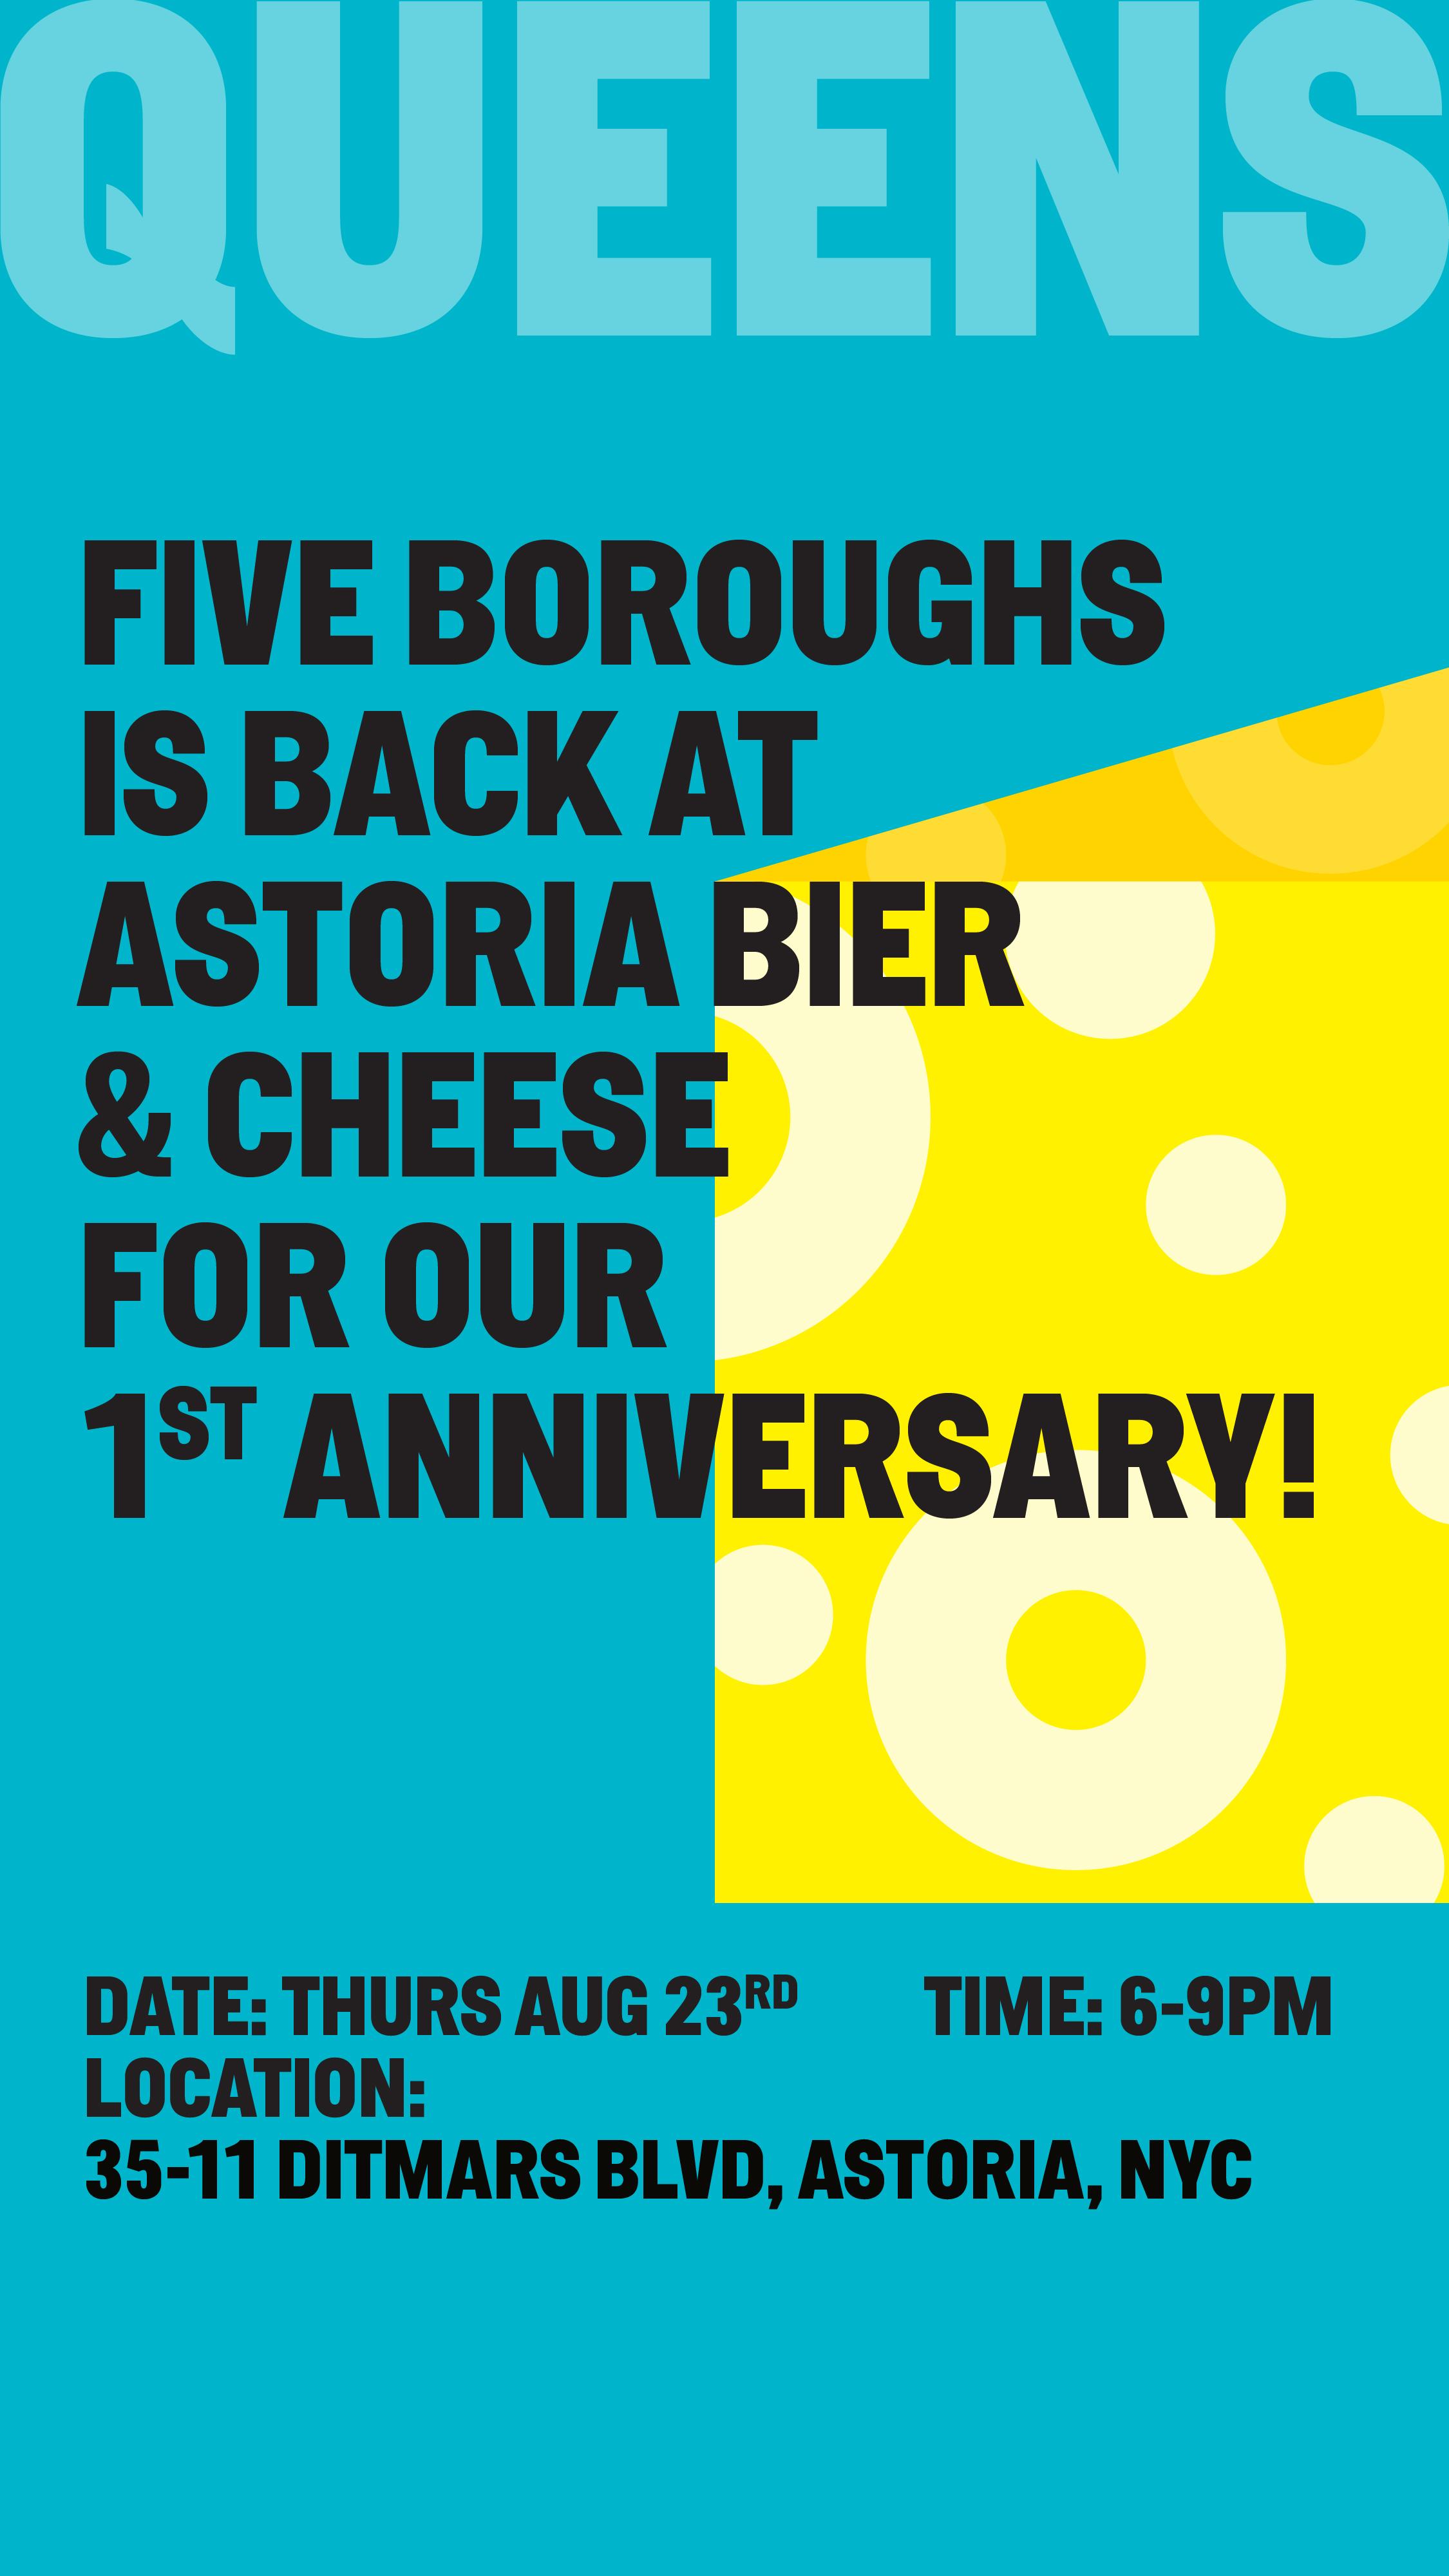 Astoria Bier & Cheese Ditmars and Five Boroughs 07252018-01.jpg